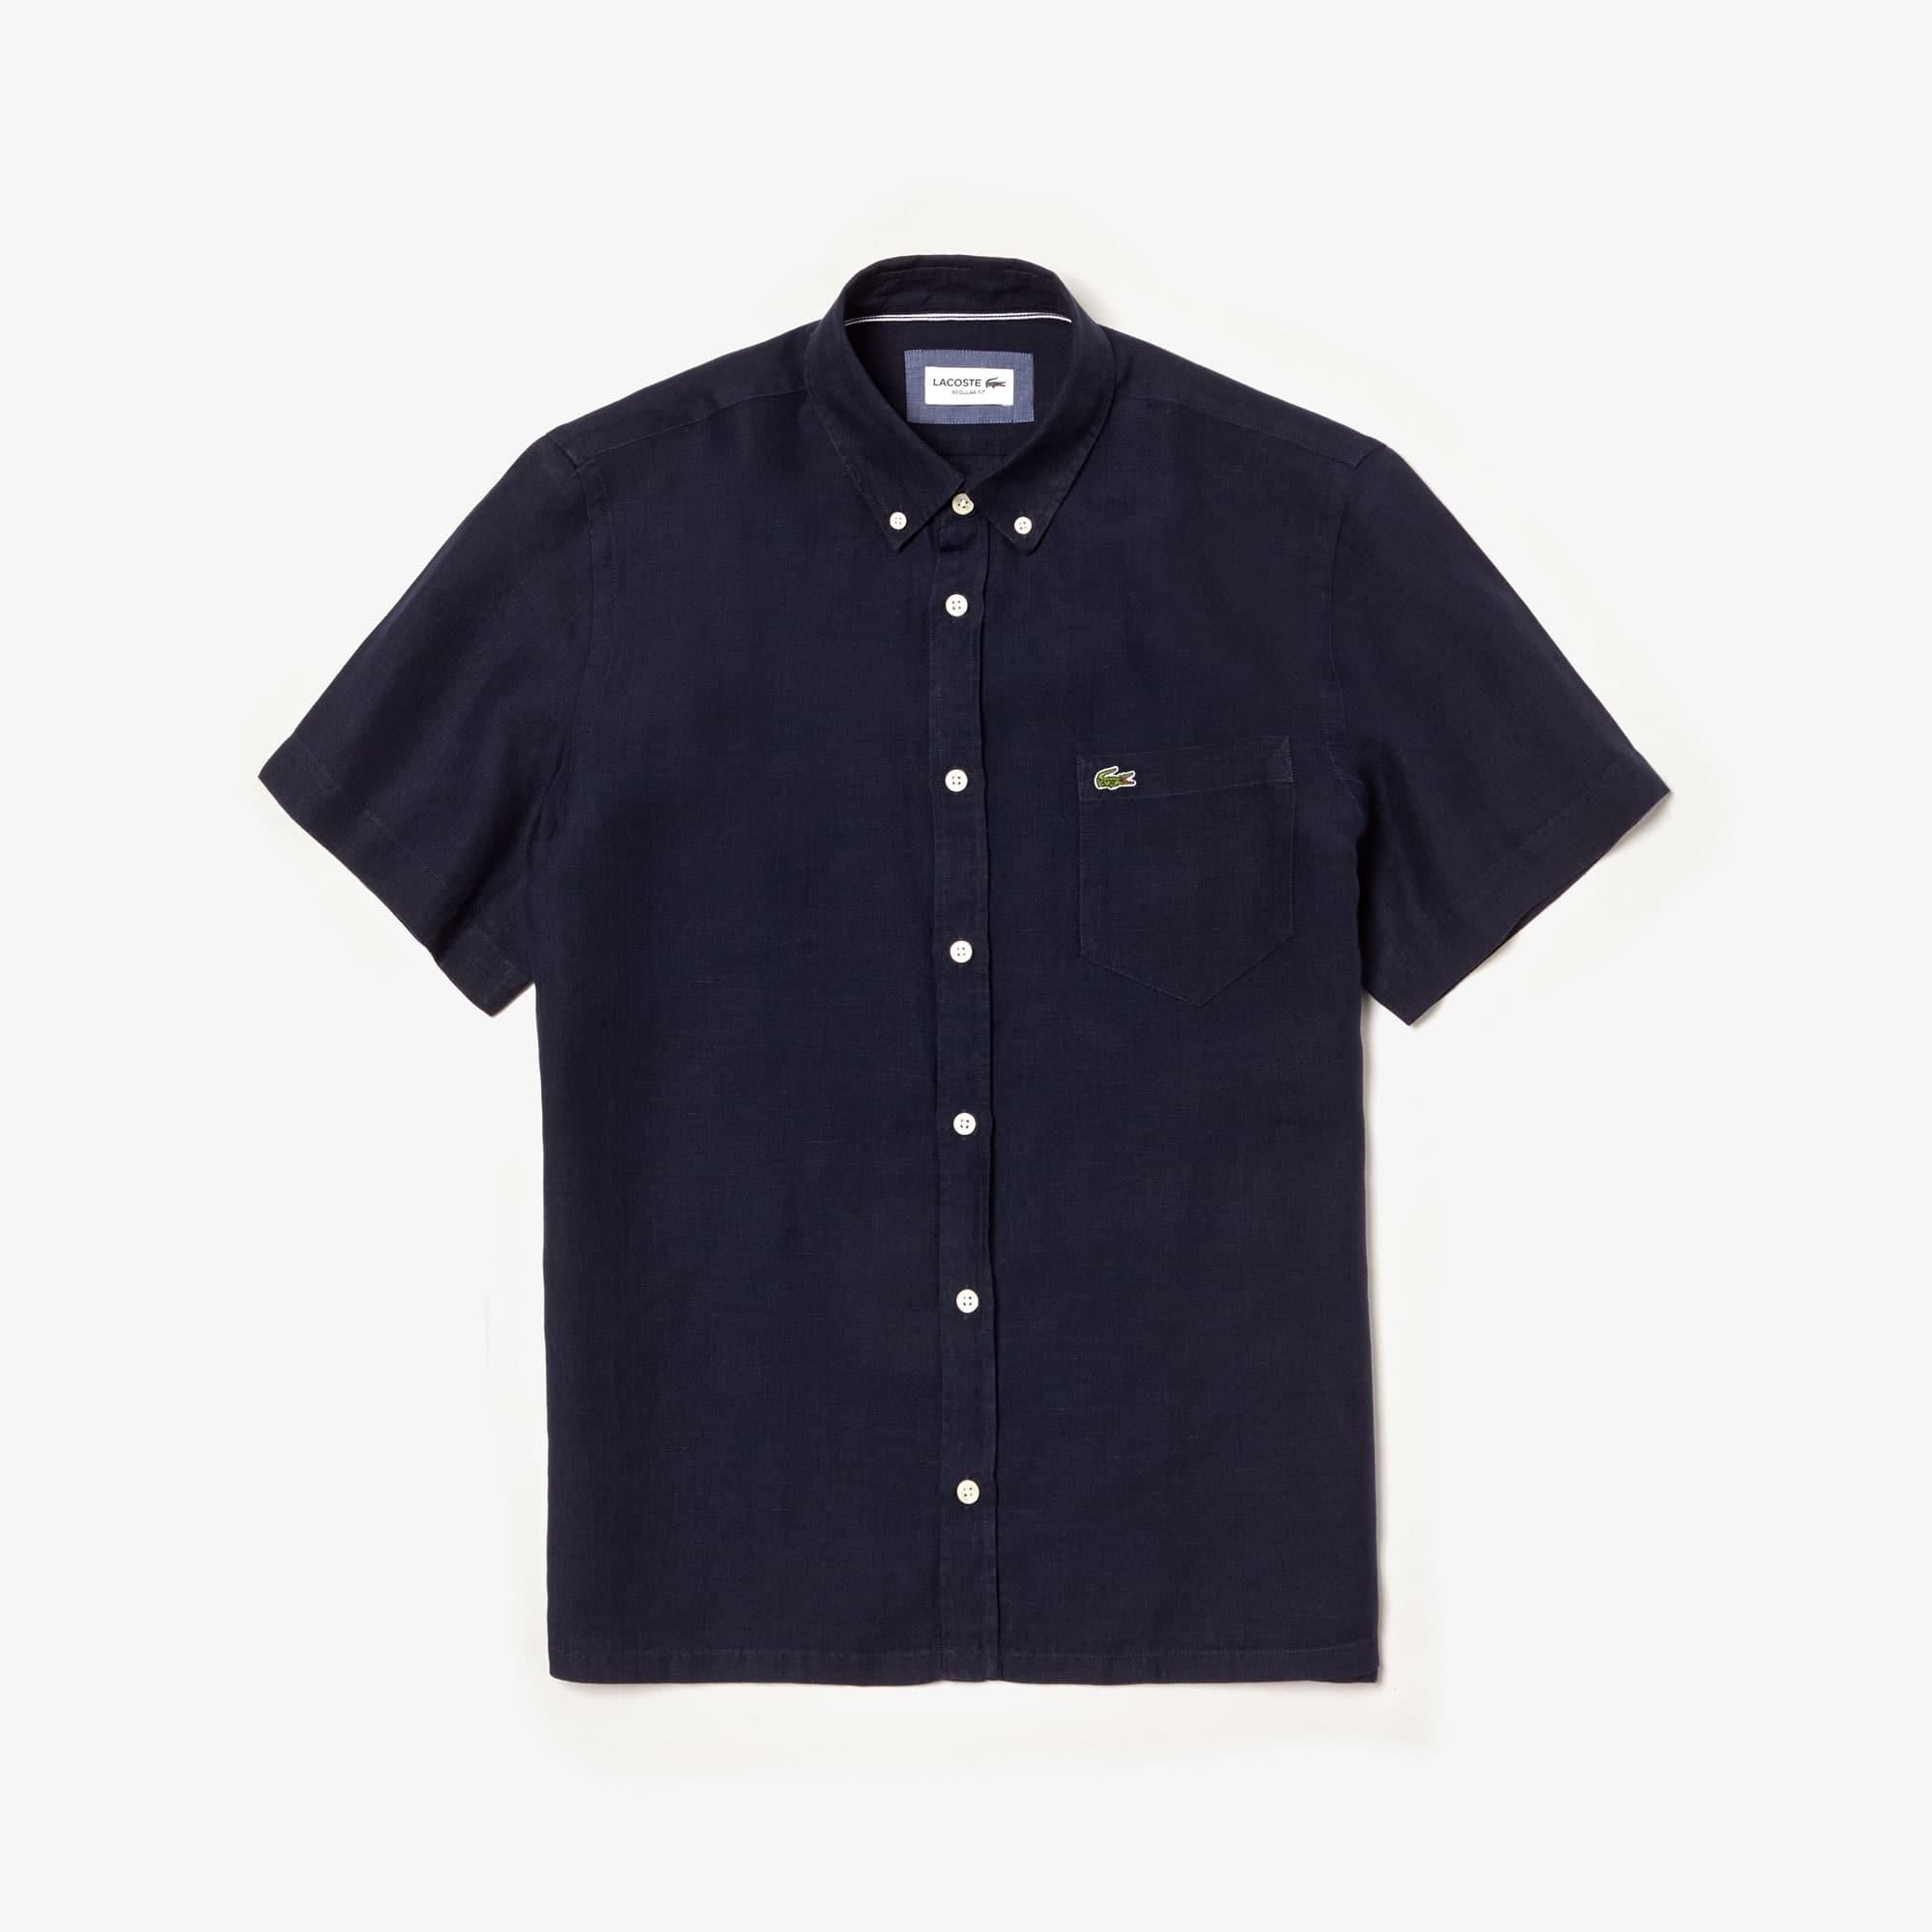 Regular Fit Herren-Hemd aus Leinen